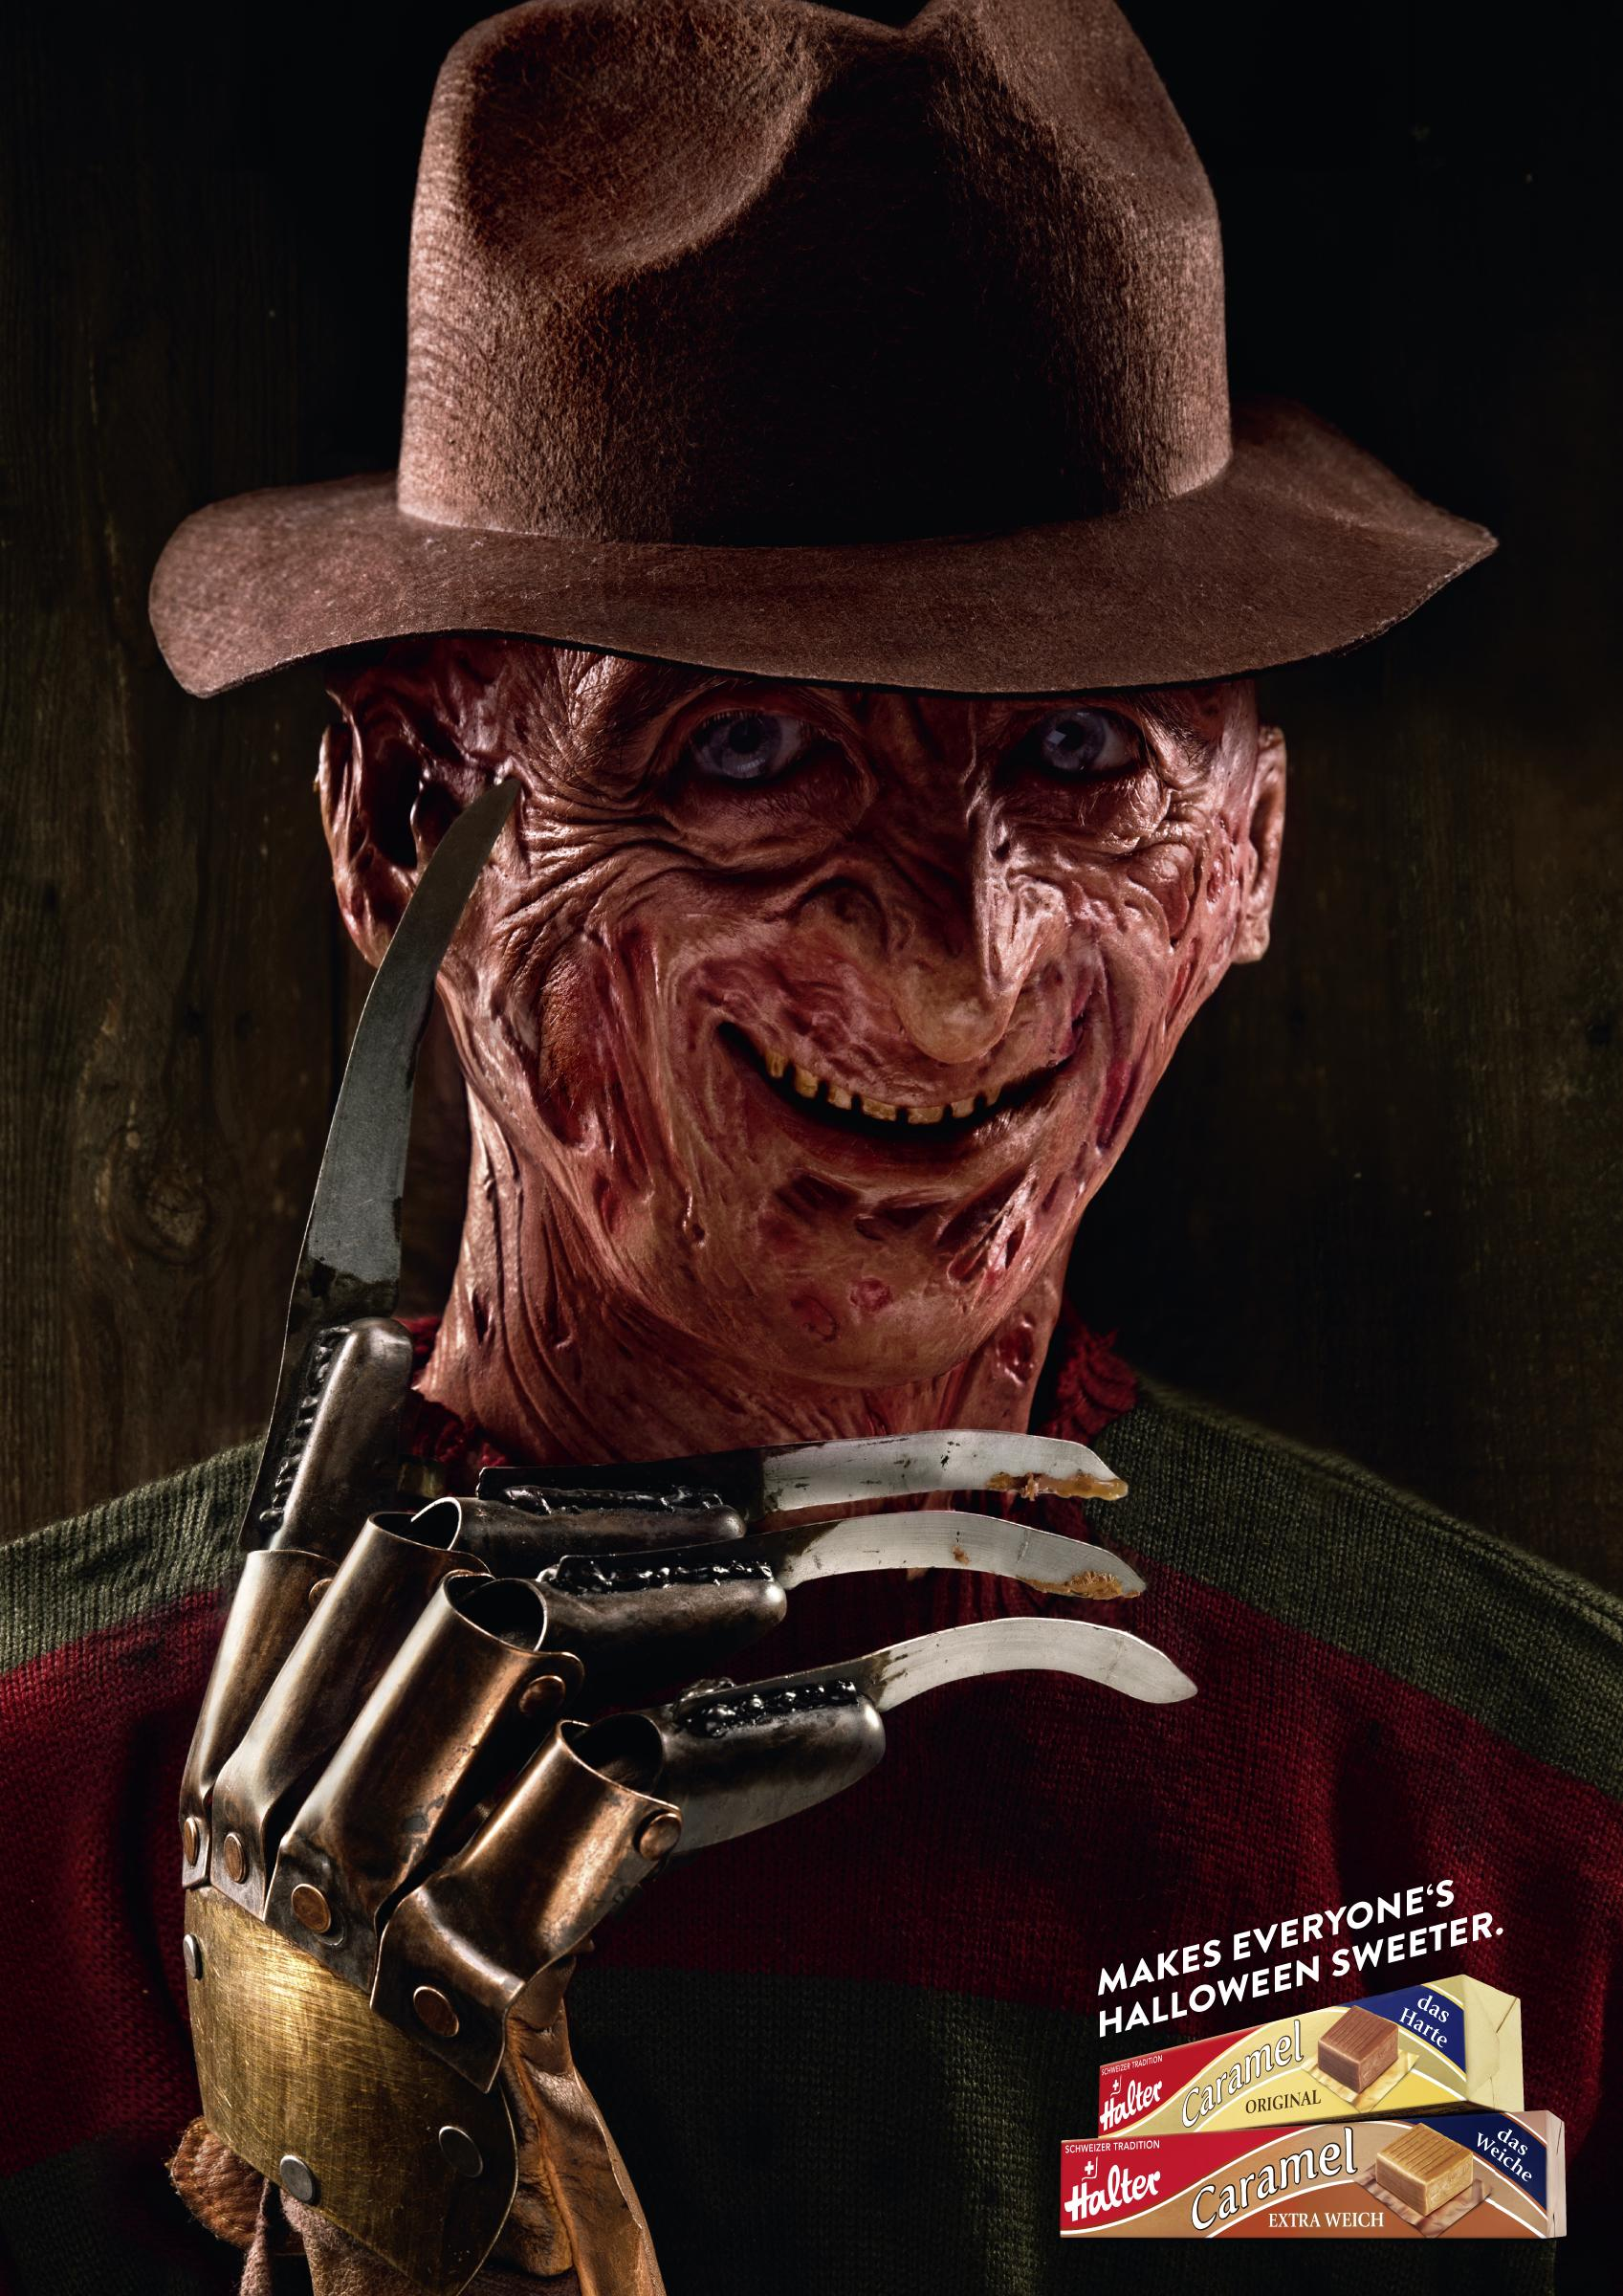 Halter Bonbons Print Ad - Halloween - Freddy